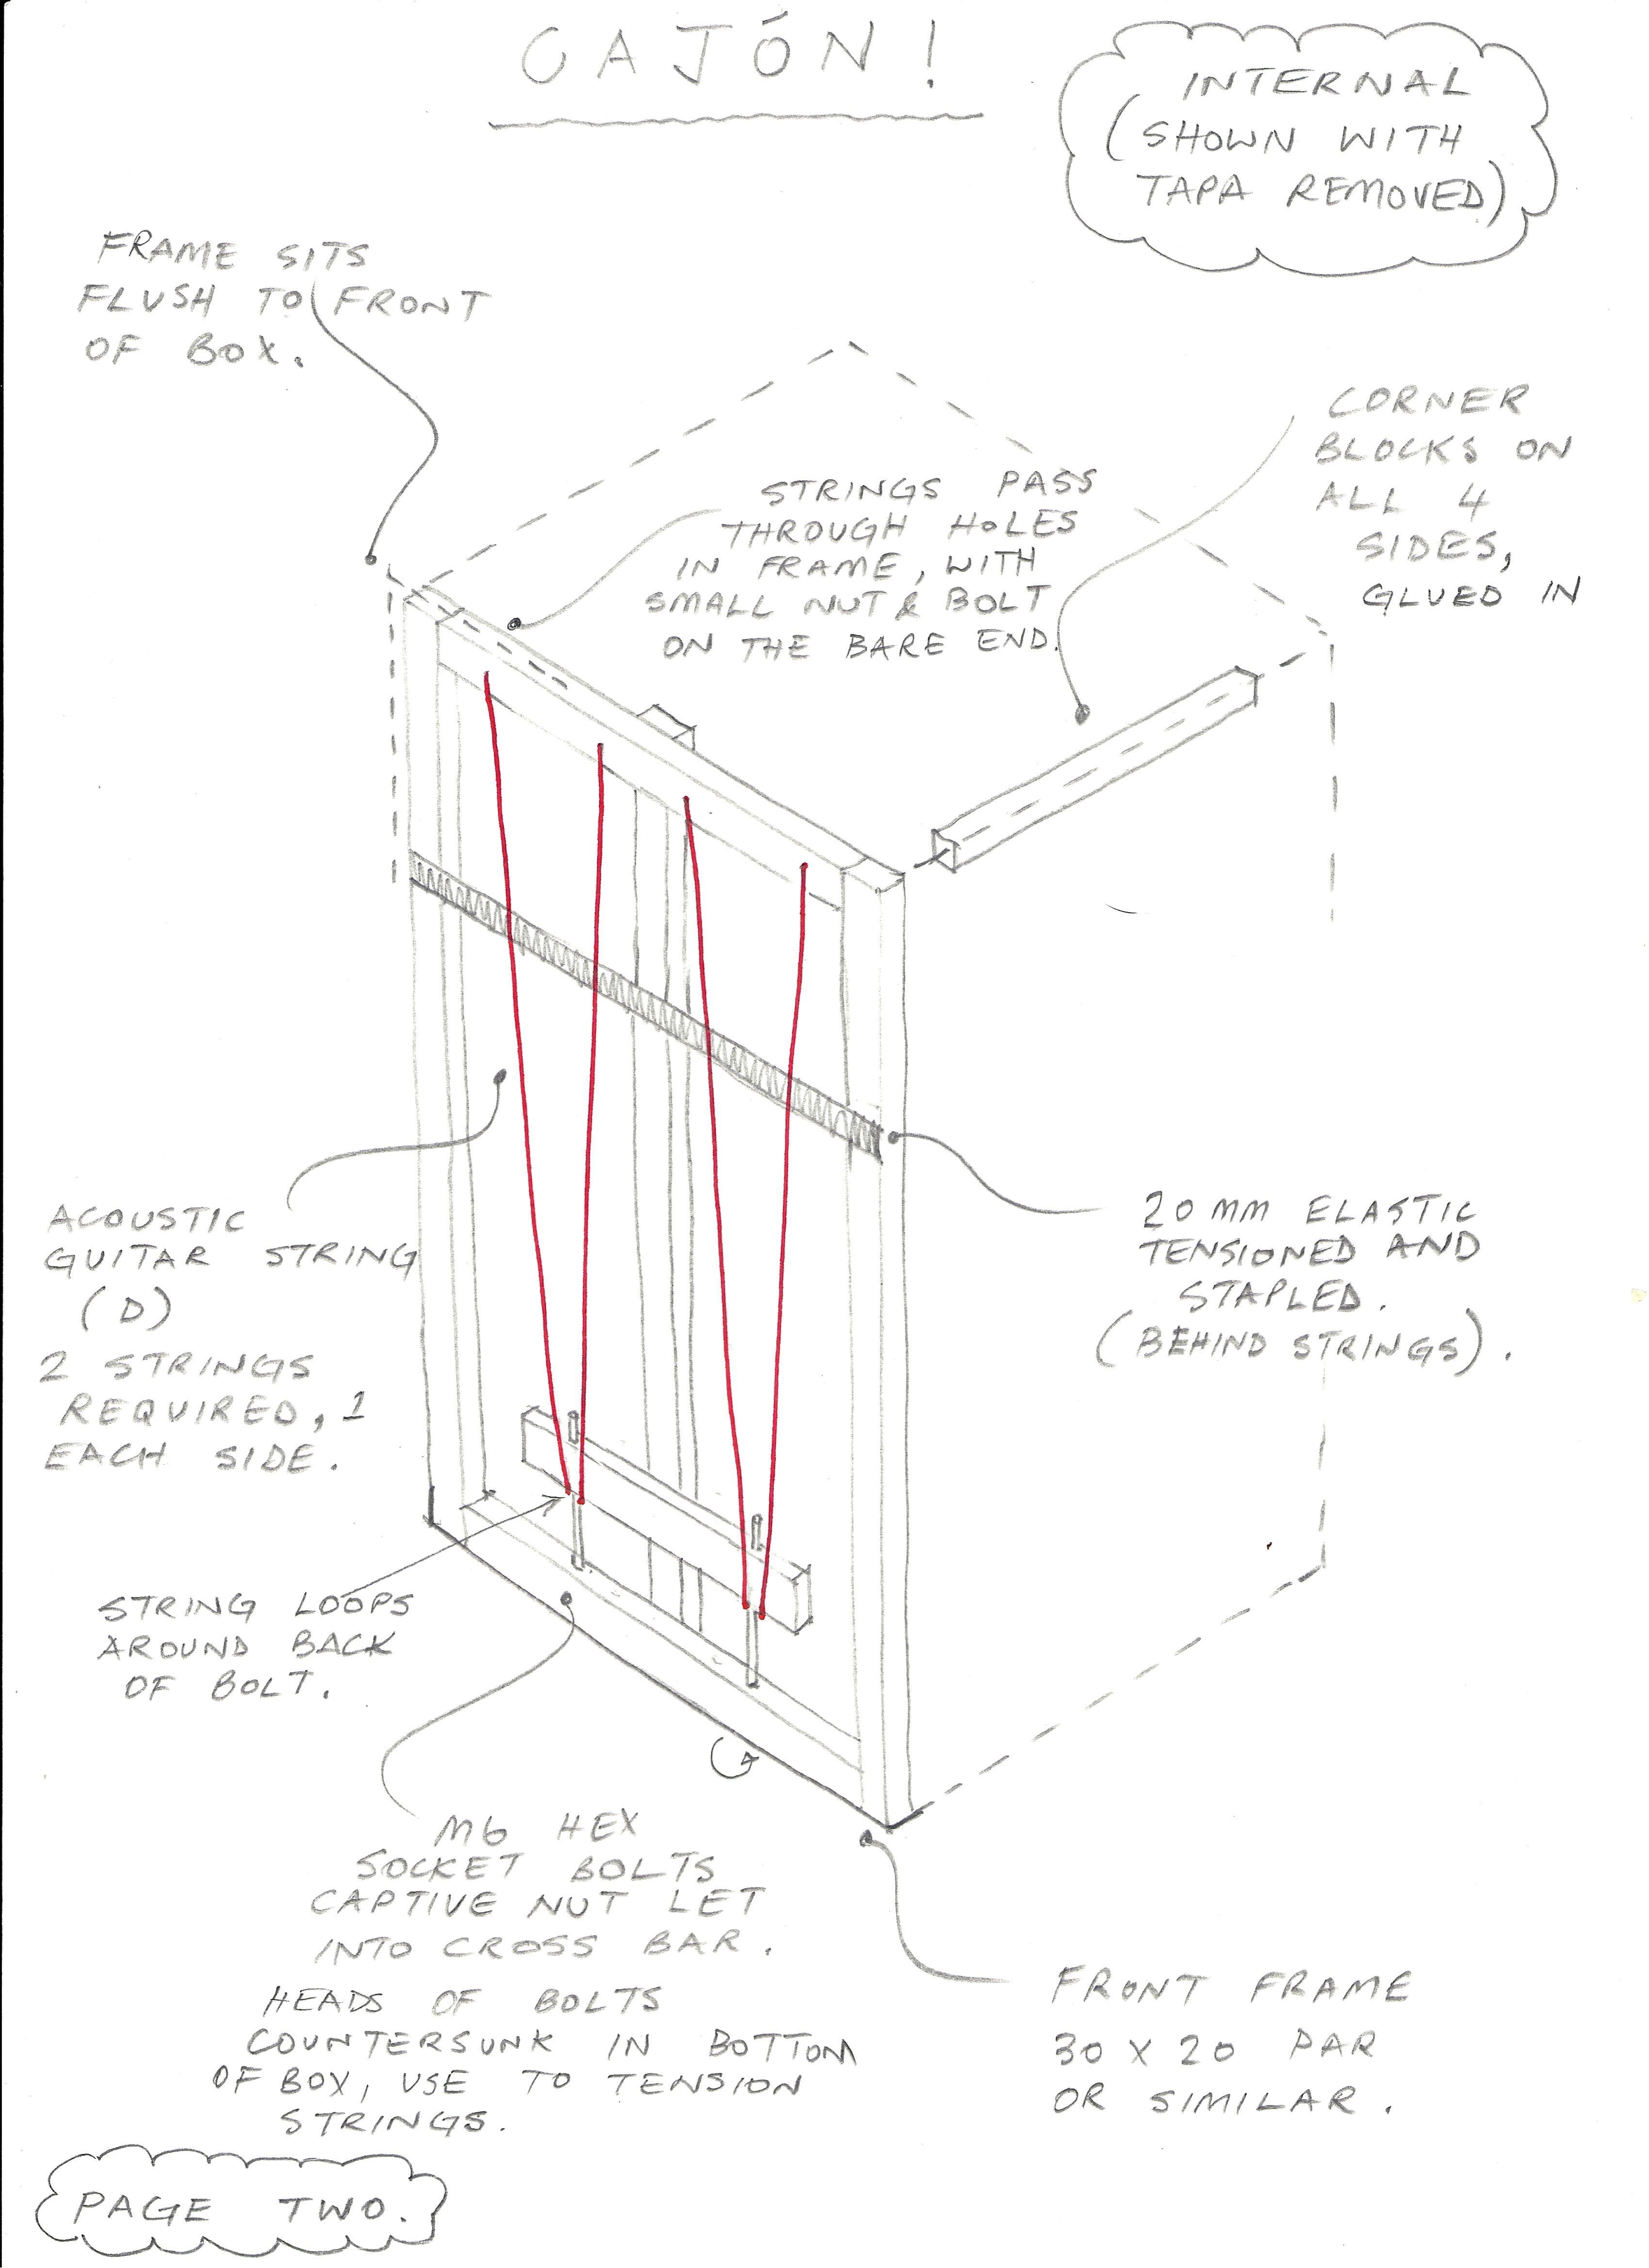 Cajon Drawing 2 Edit Jpg 3 399 4 675 Pixels Diy Musical Instruments How To Make Cajon Drum